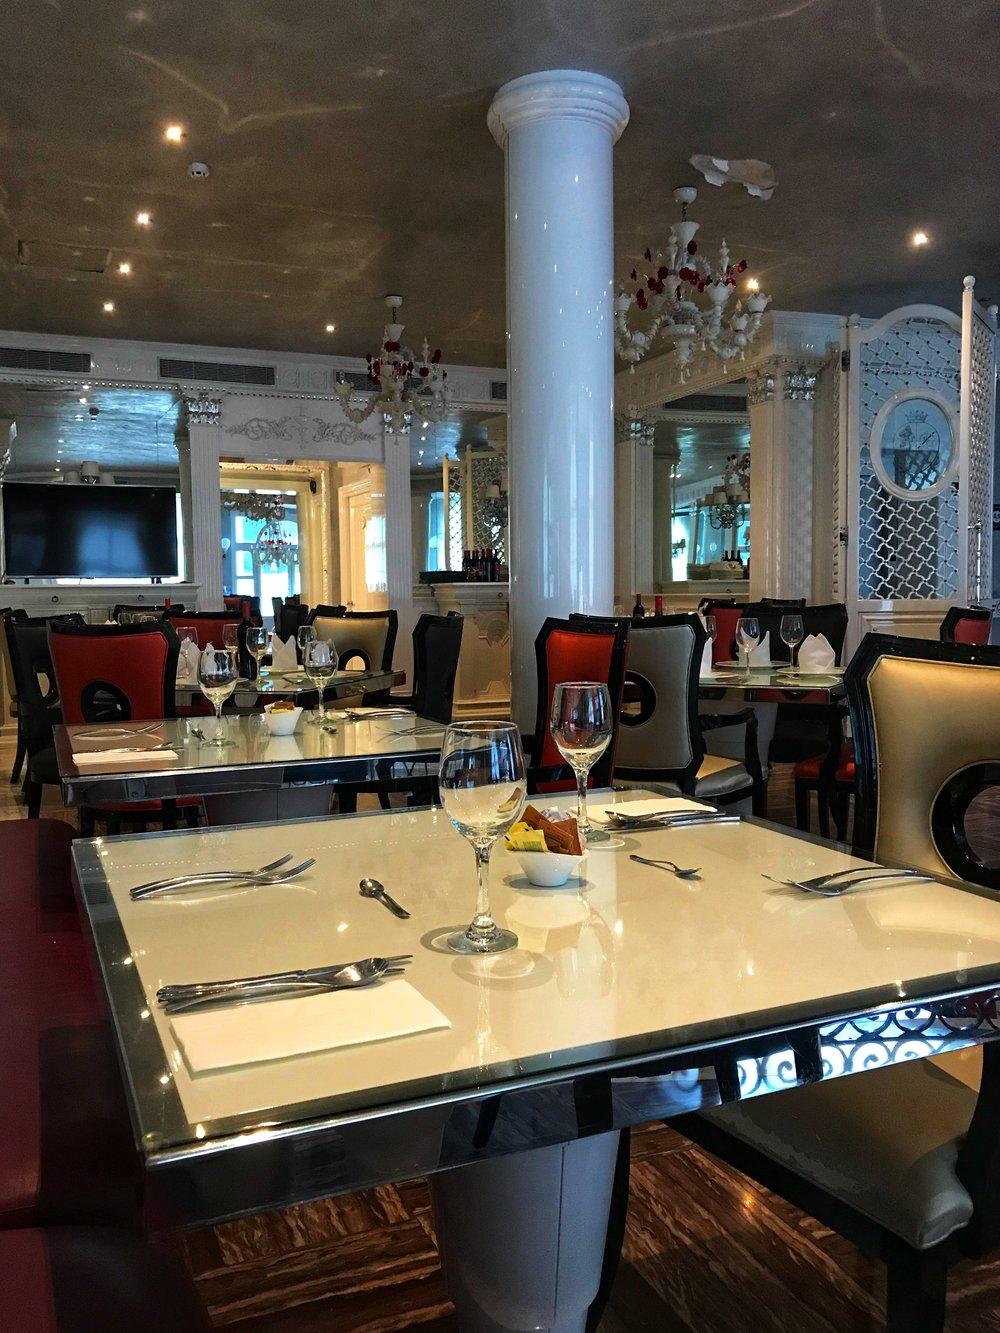 The Villa Palma Boutique Hotel restaurant